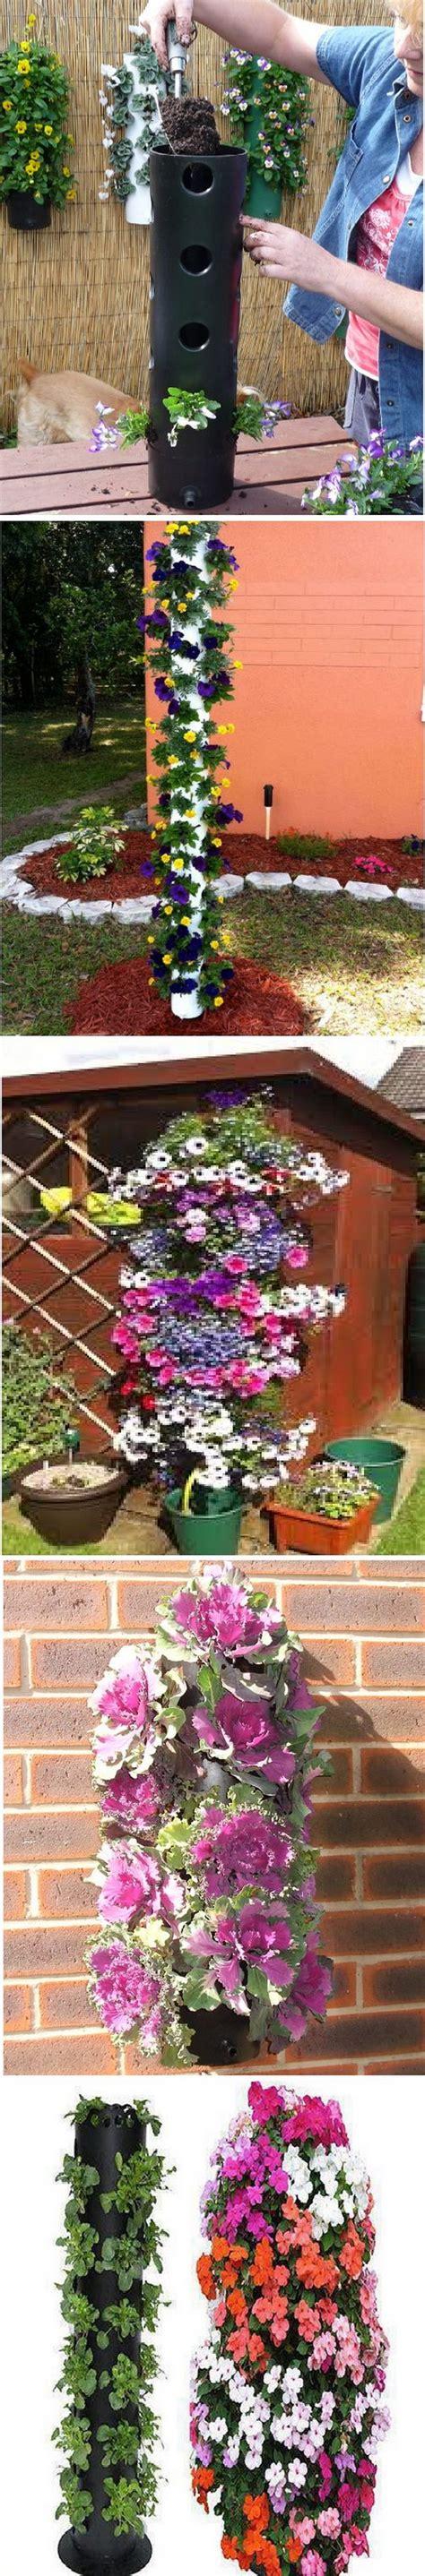 Polanter Vertical Gardening System by 30 Cool Indoor And Outdoor Vertical Garden Ideas 2017